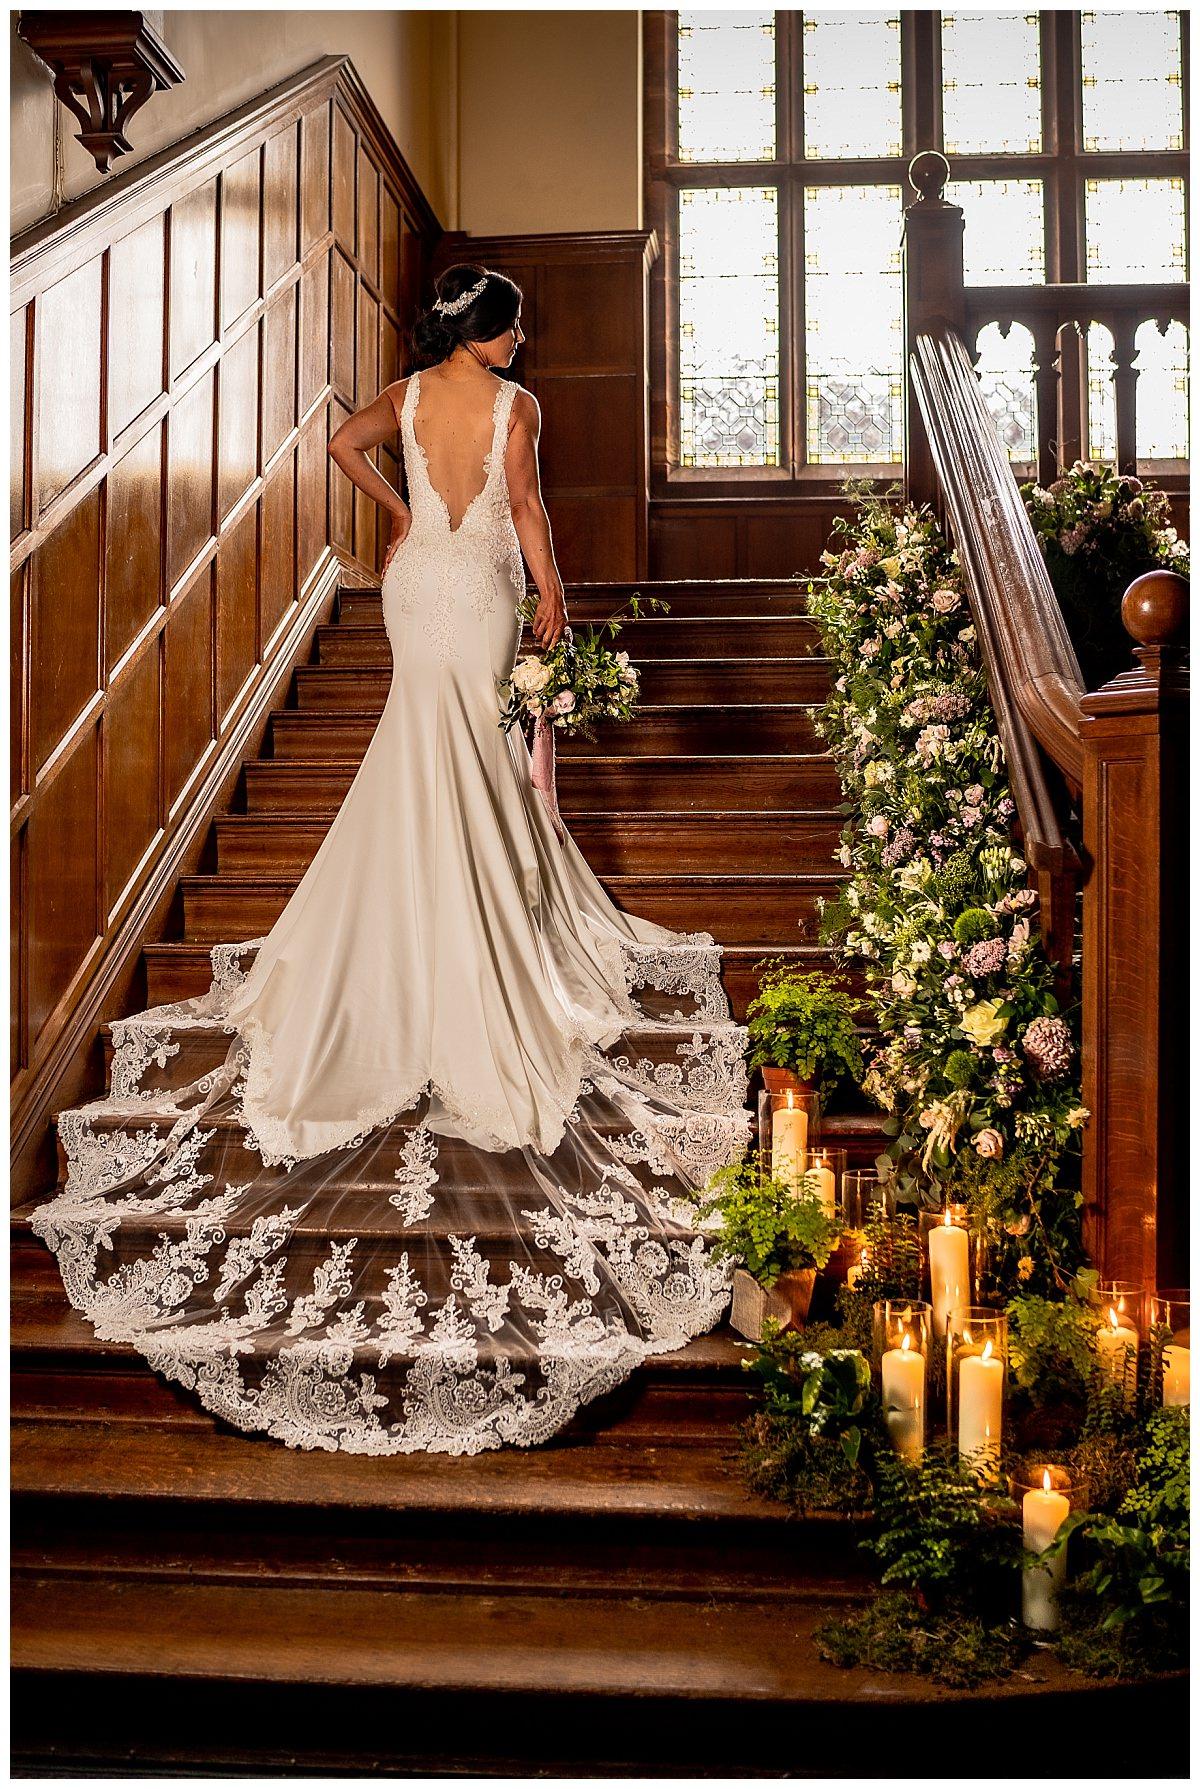 Best wedding venue Staffordshire